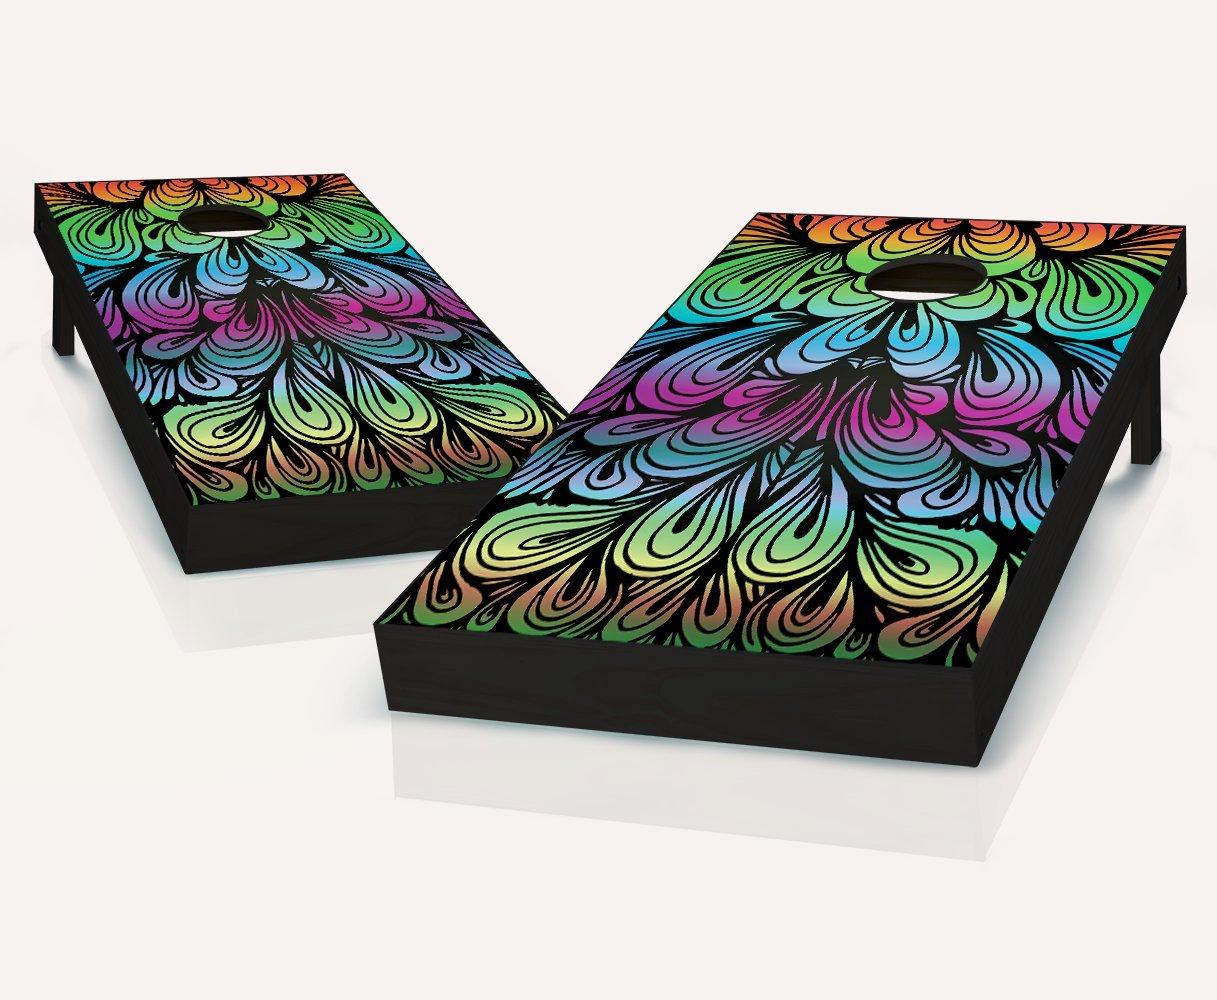 Tailgating Pros Rainbow Swirl Cornhole Boards withのセット8 Cornhole Bags B07BVZYL35